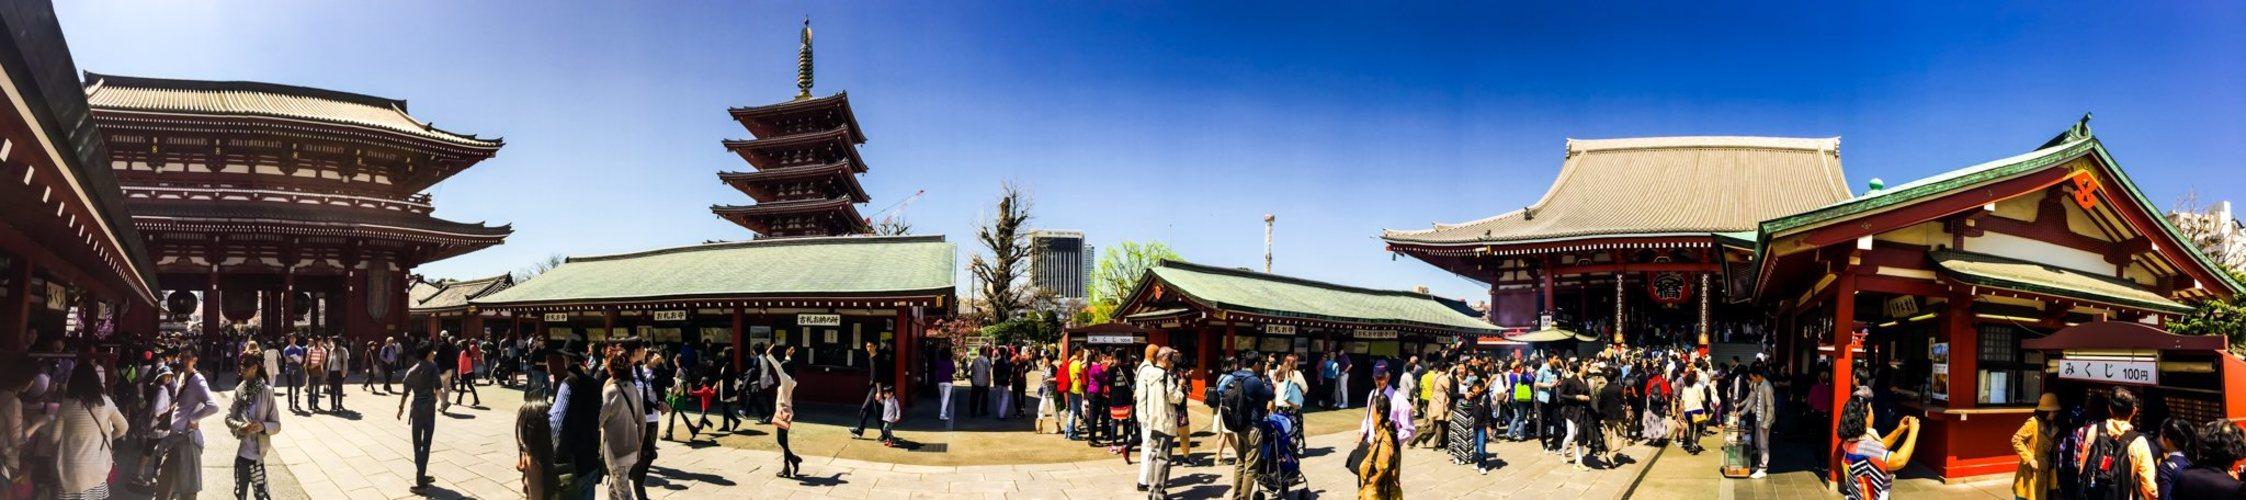 Panorámica del templo Sensoji en Asakusa, Tokio